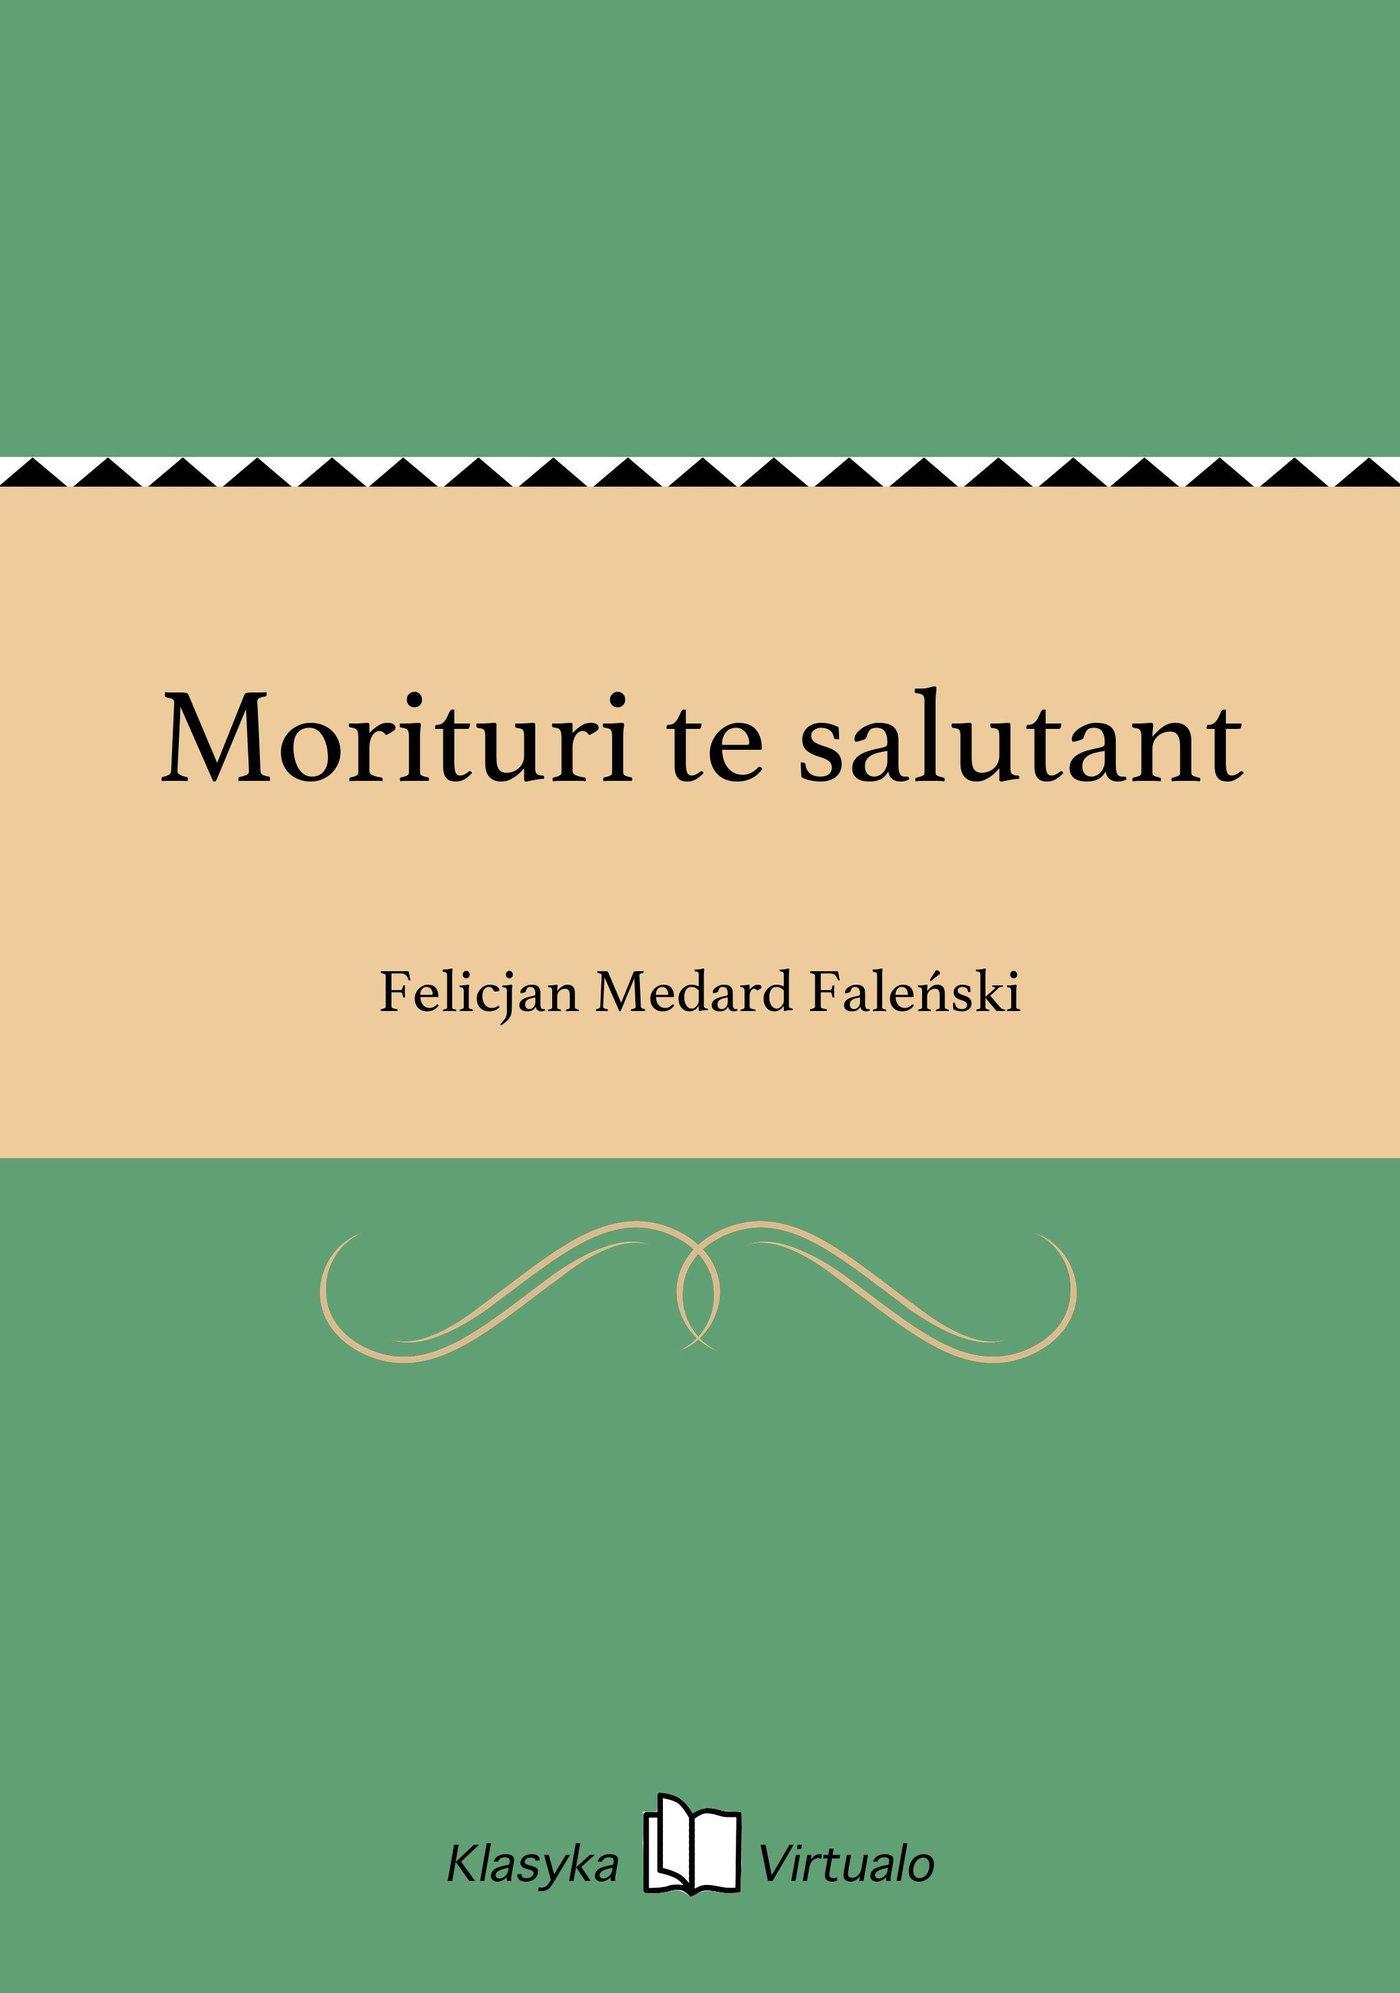 Morituri te salutant - Ebook (Książka EPUB) do pobrania w formacie EPUB